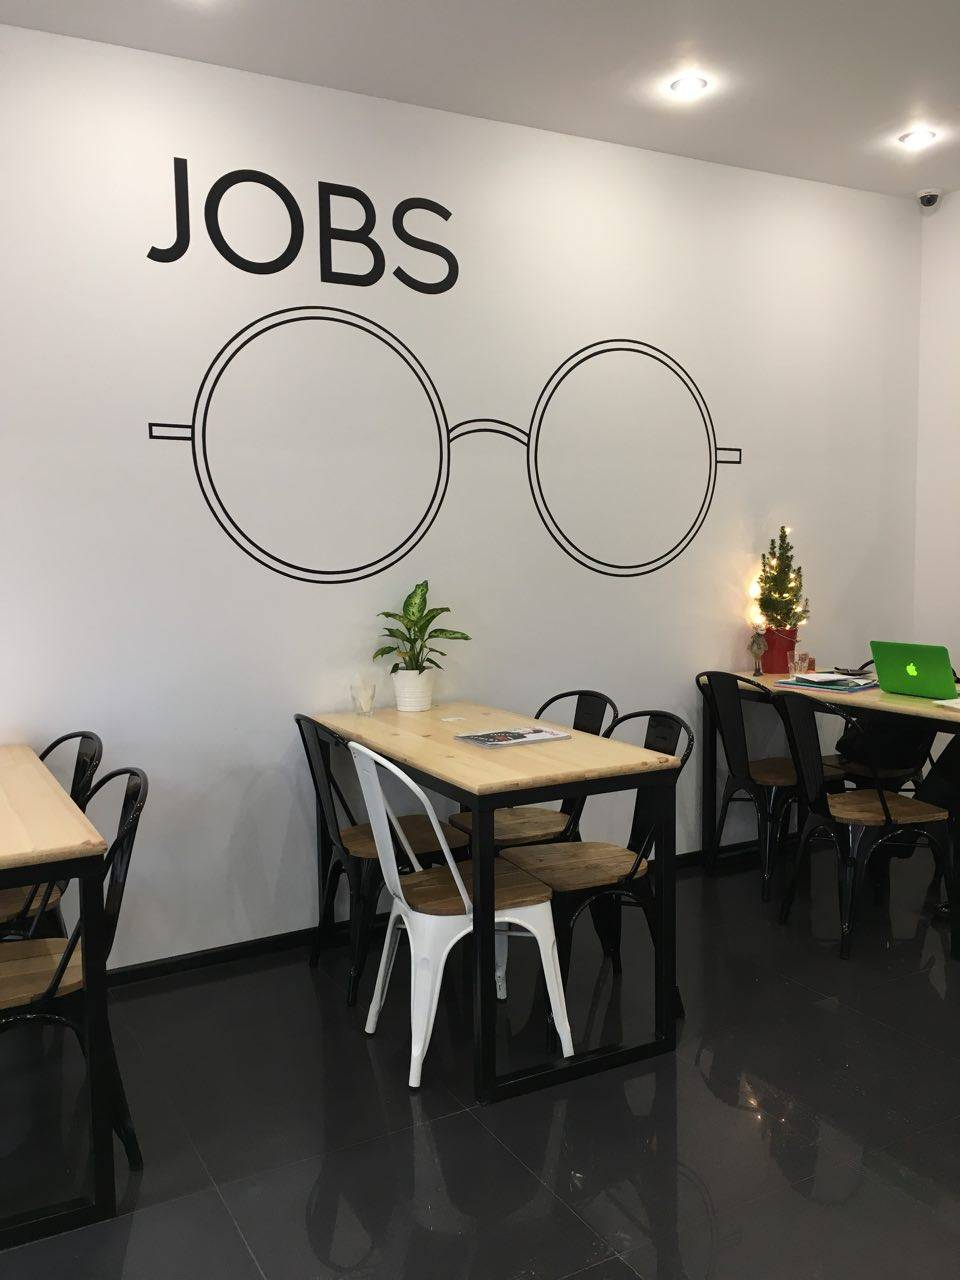 Jobs кофе и коворкинг